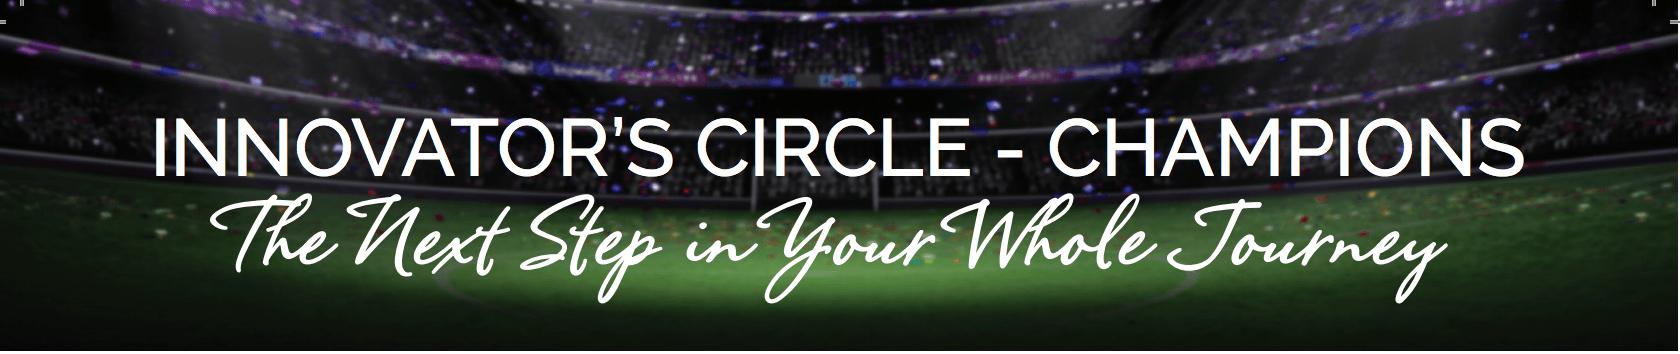 Innovator's Champion Circle